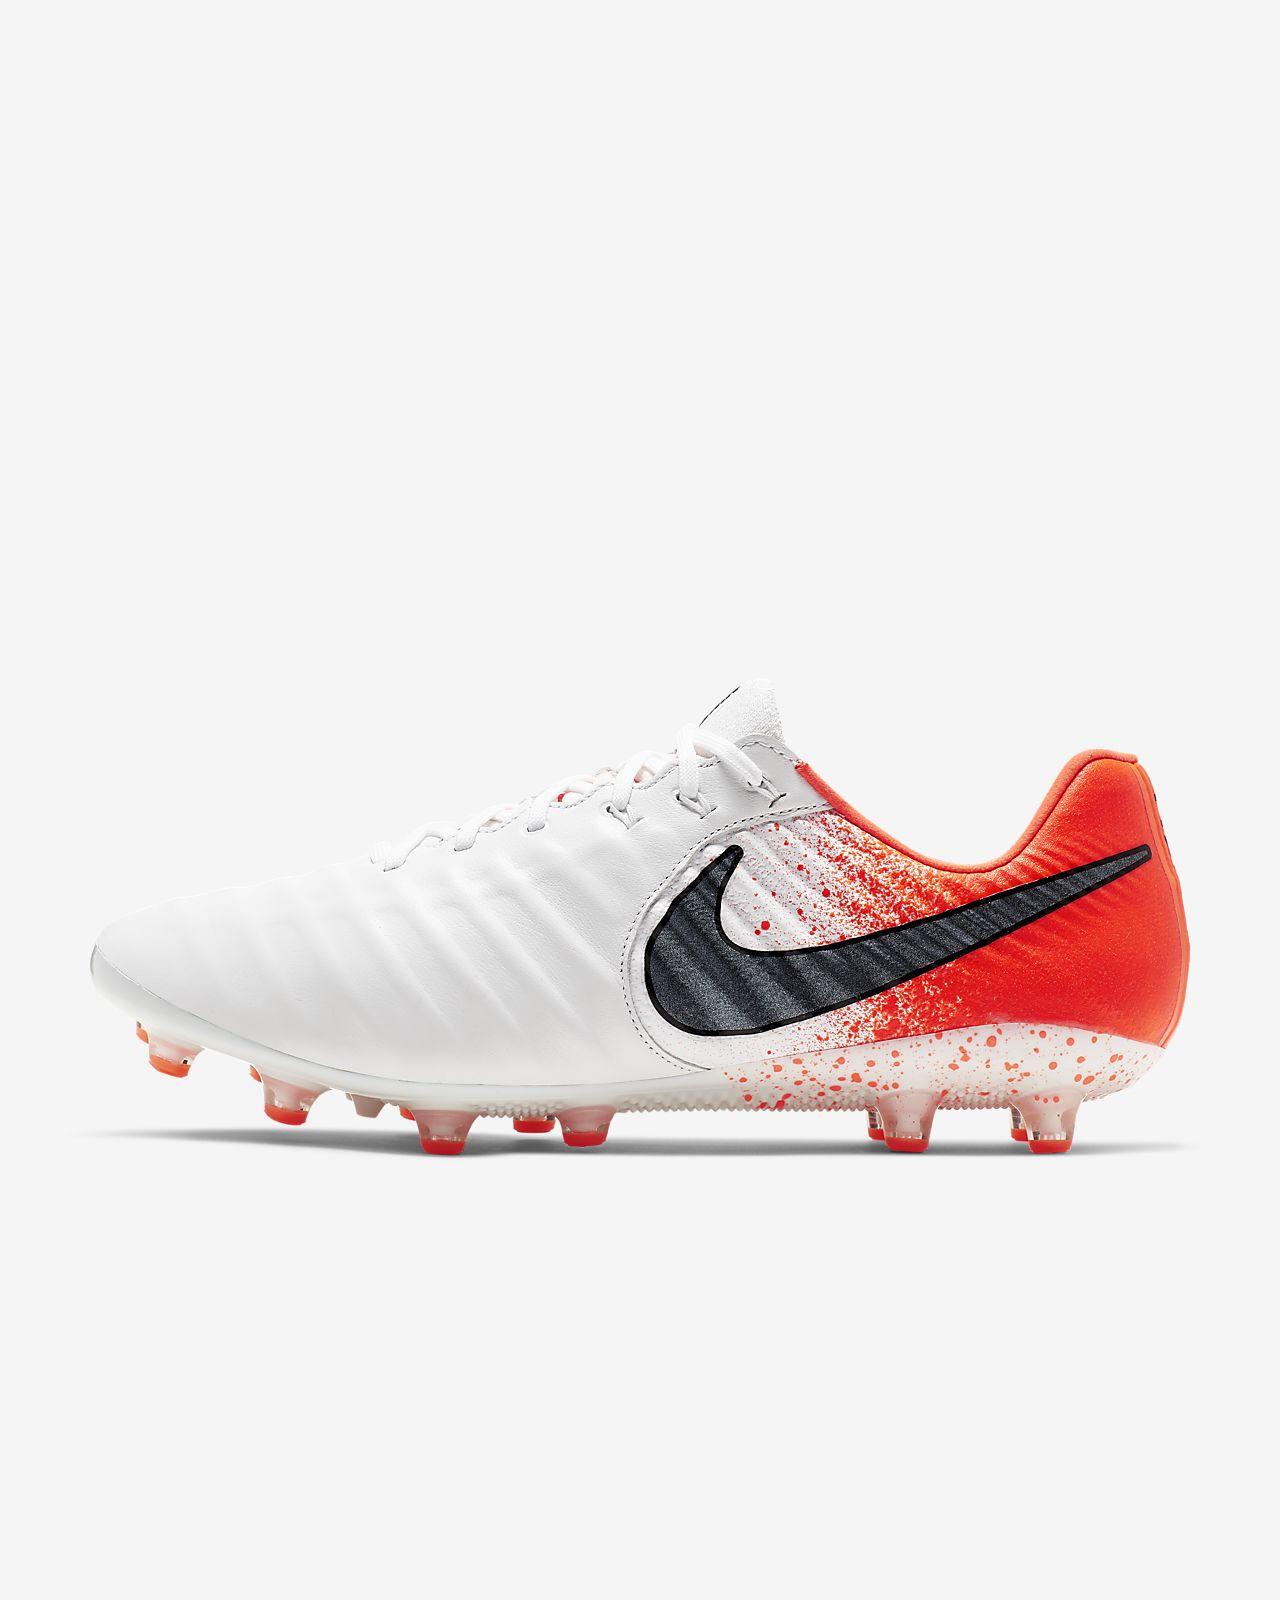 Nike Legend VII Elite AG-PRO Botes de futbol per a gespa artificial